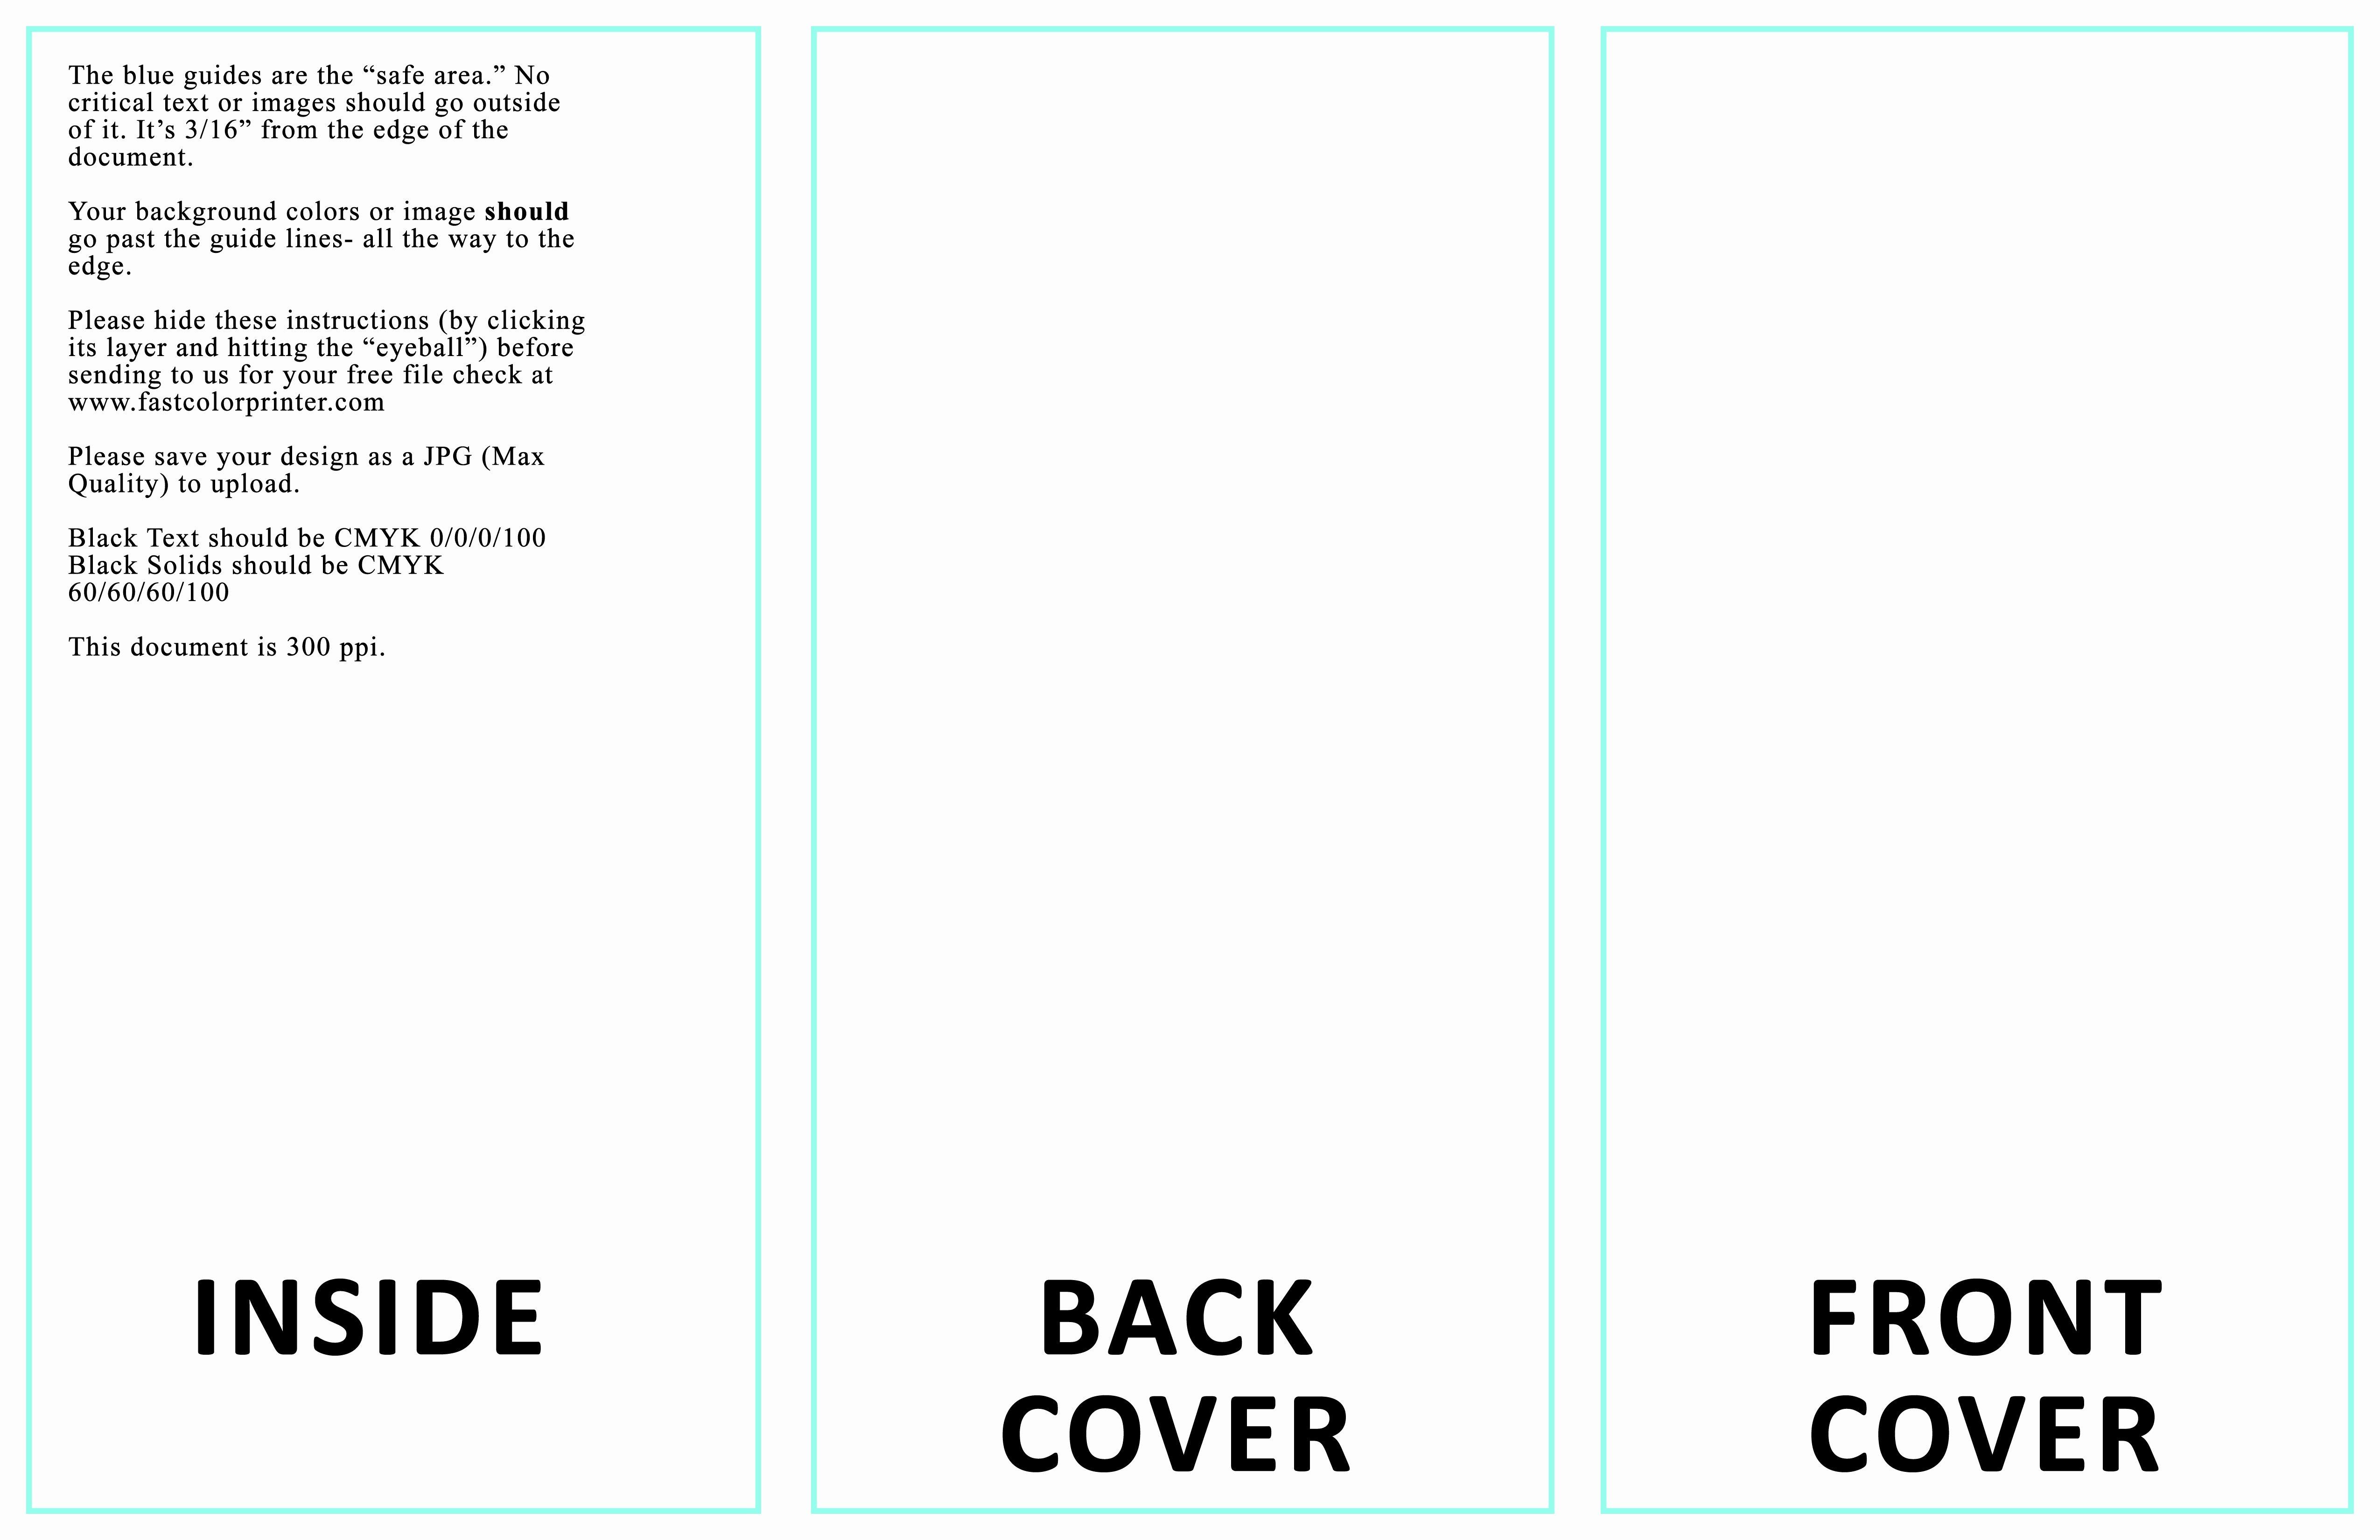 11x17 Tri Fold Brochure Template Awesome Microsoft Word Tri Fold Template Portablegasgrillweber